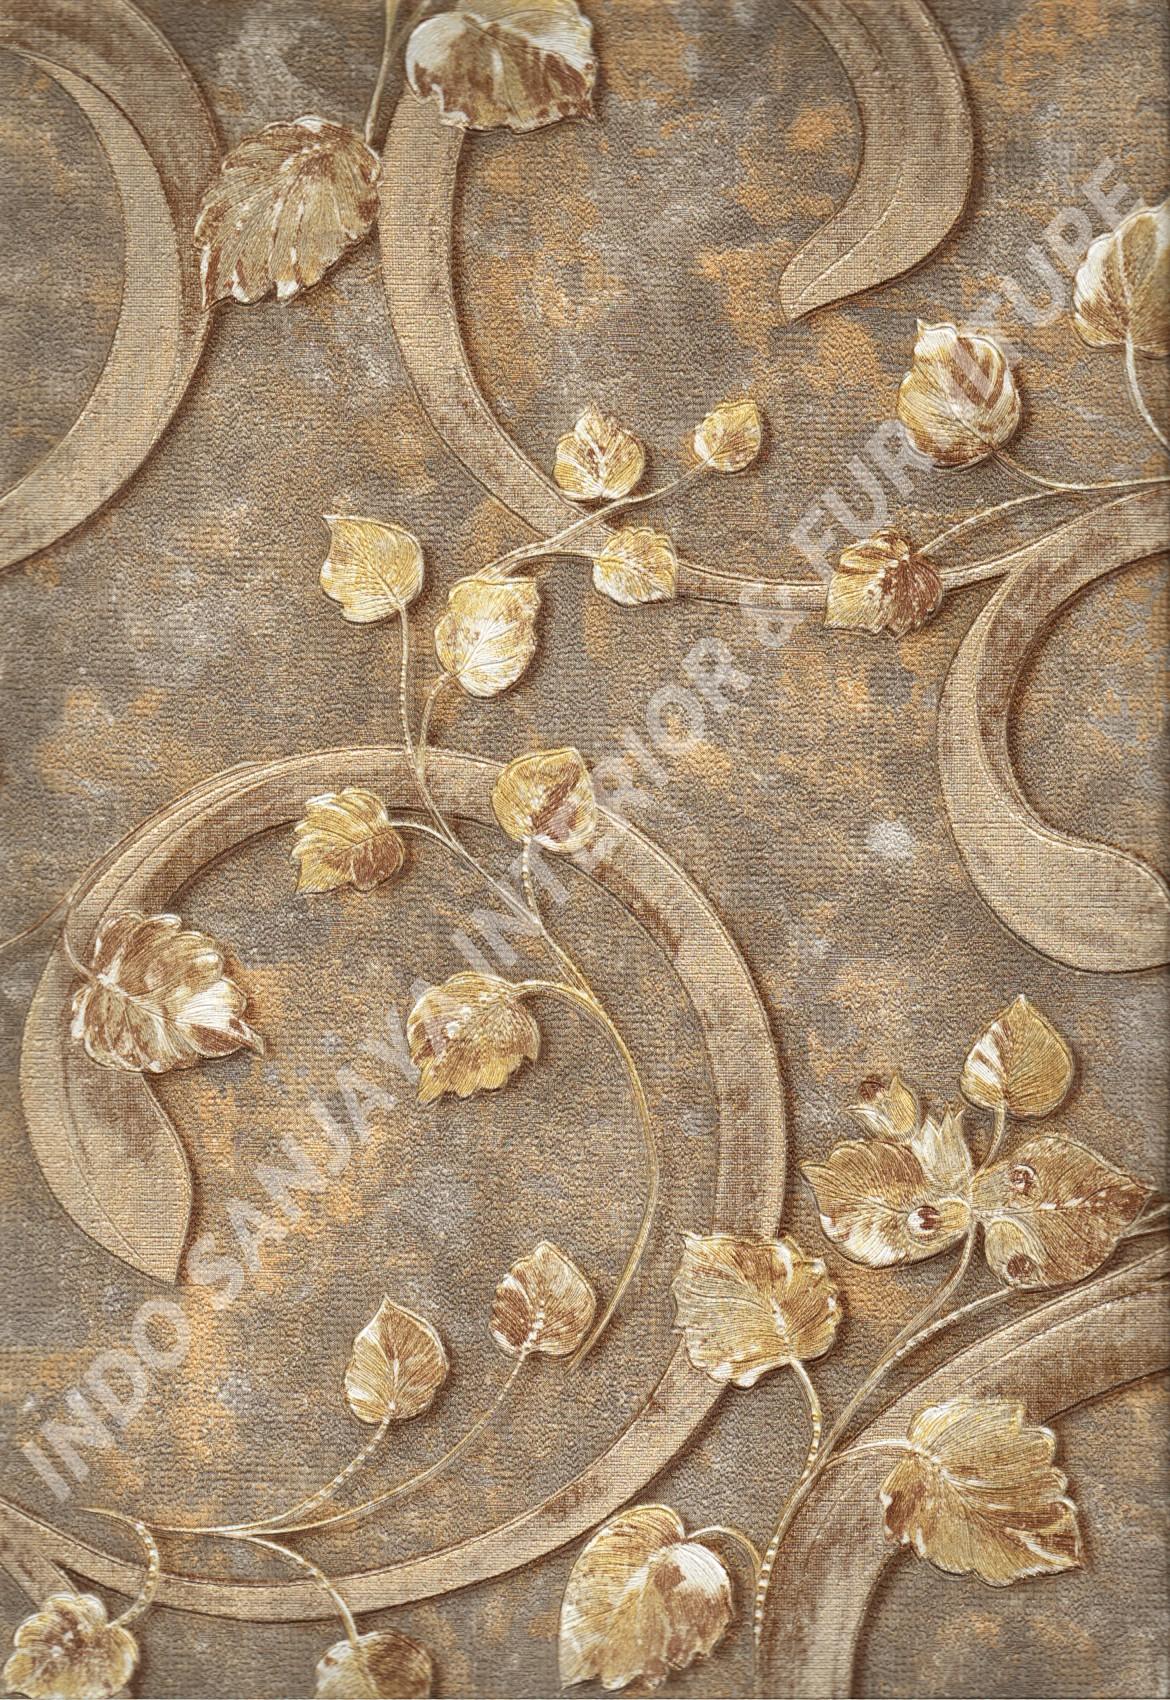 wallpaper   Wallpaper Klasik Batik (Damask) DL10404:DL10404 corak  warna